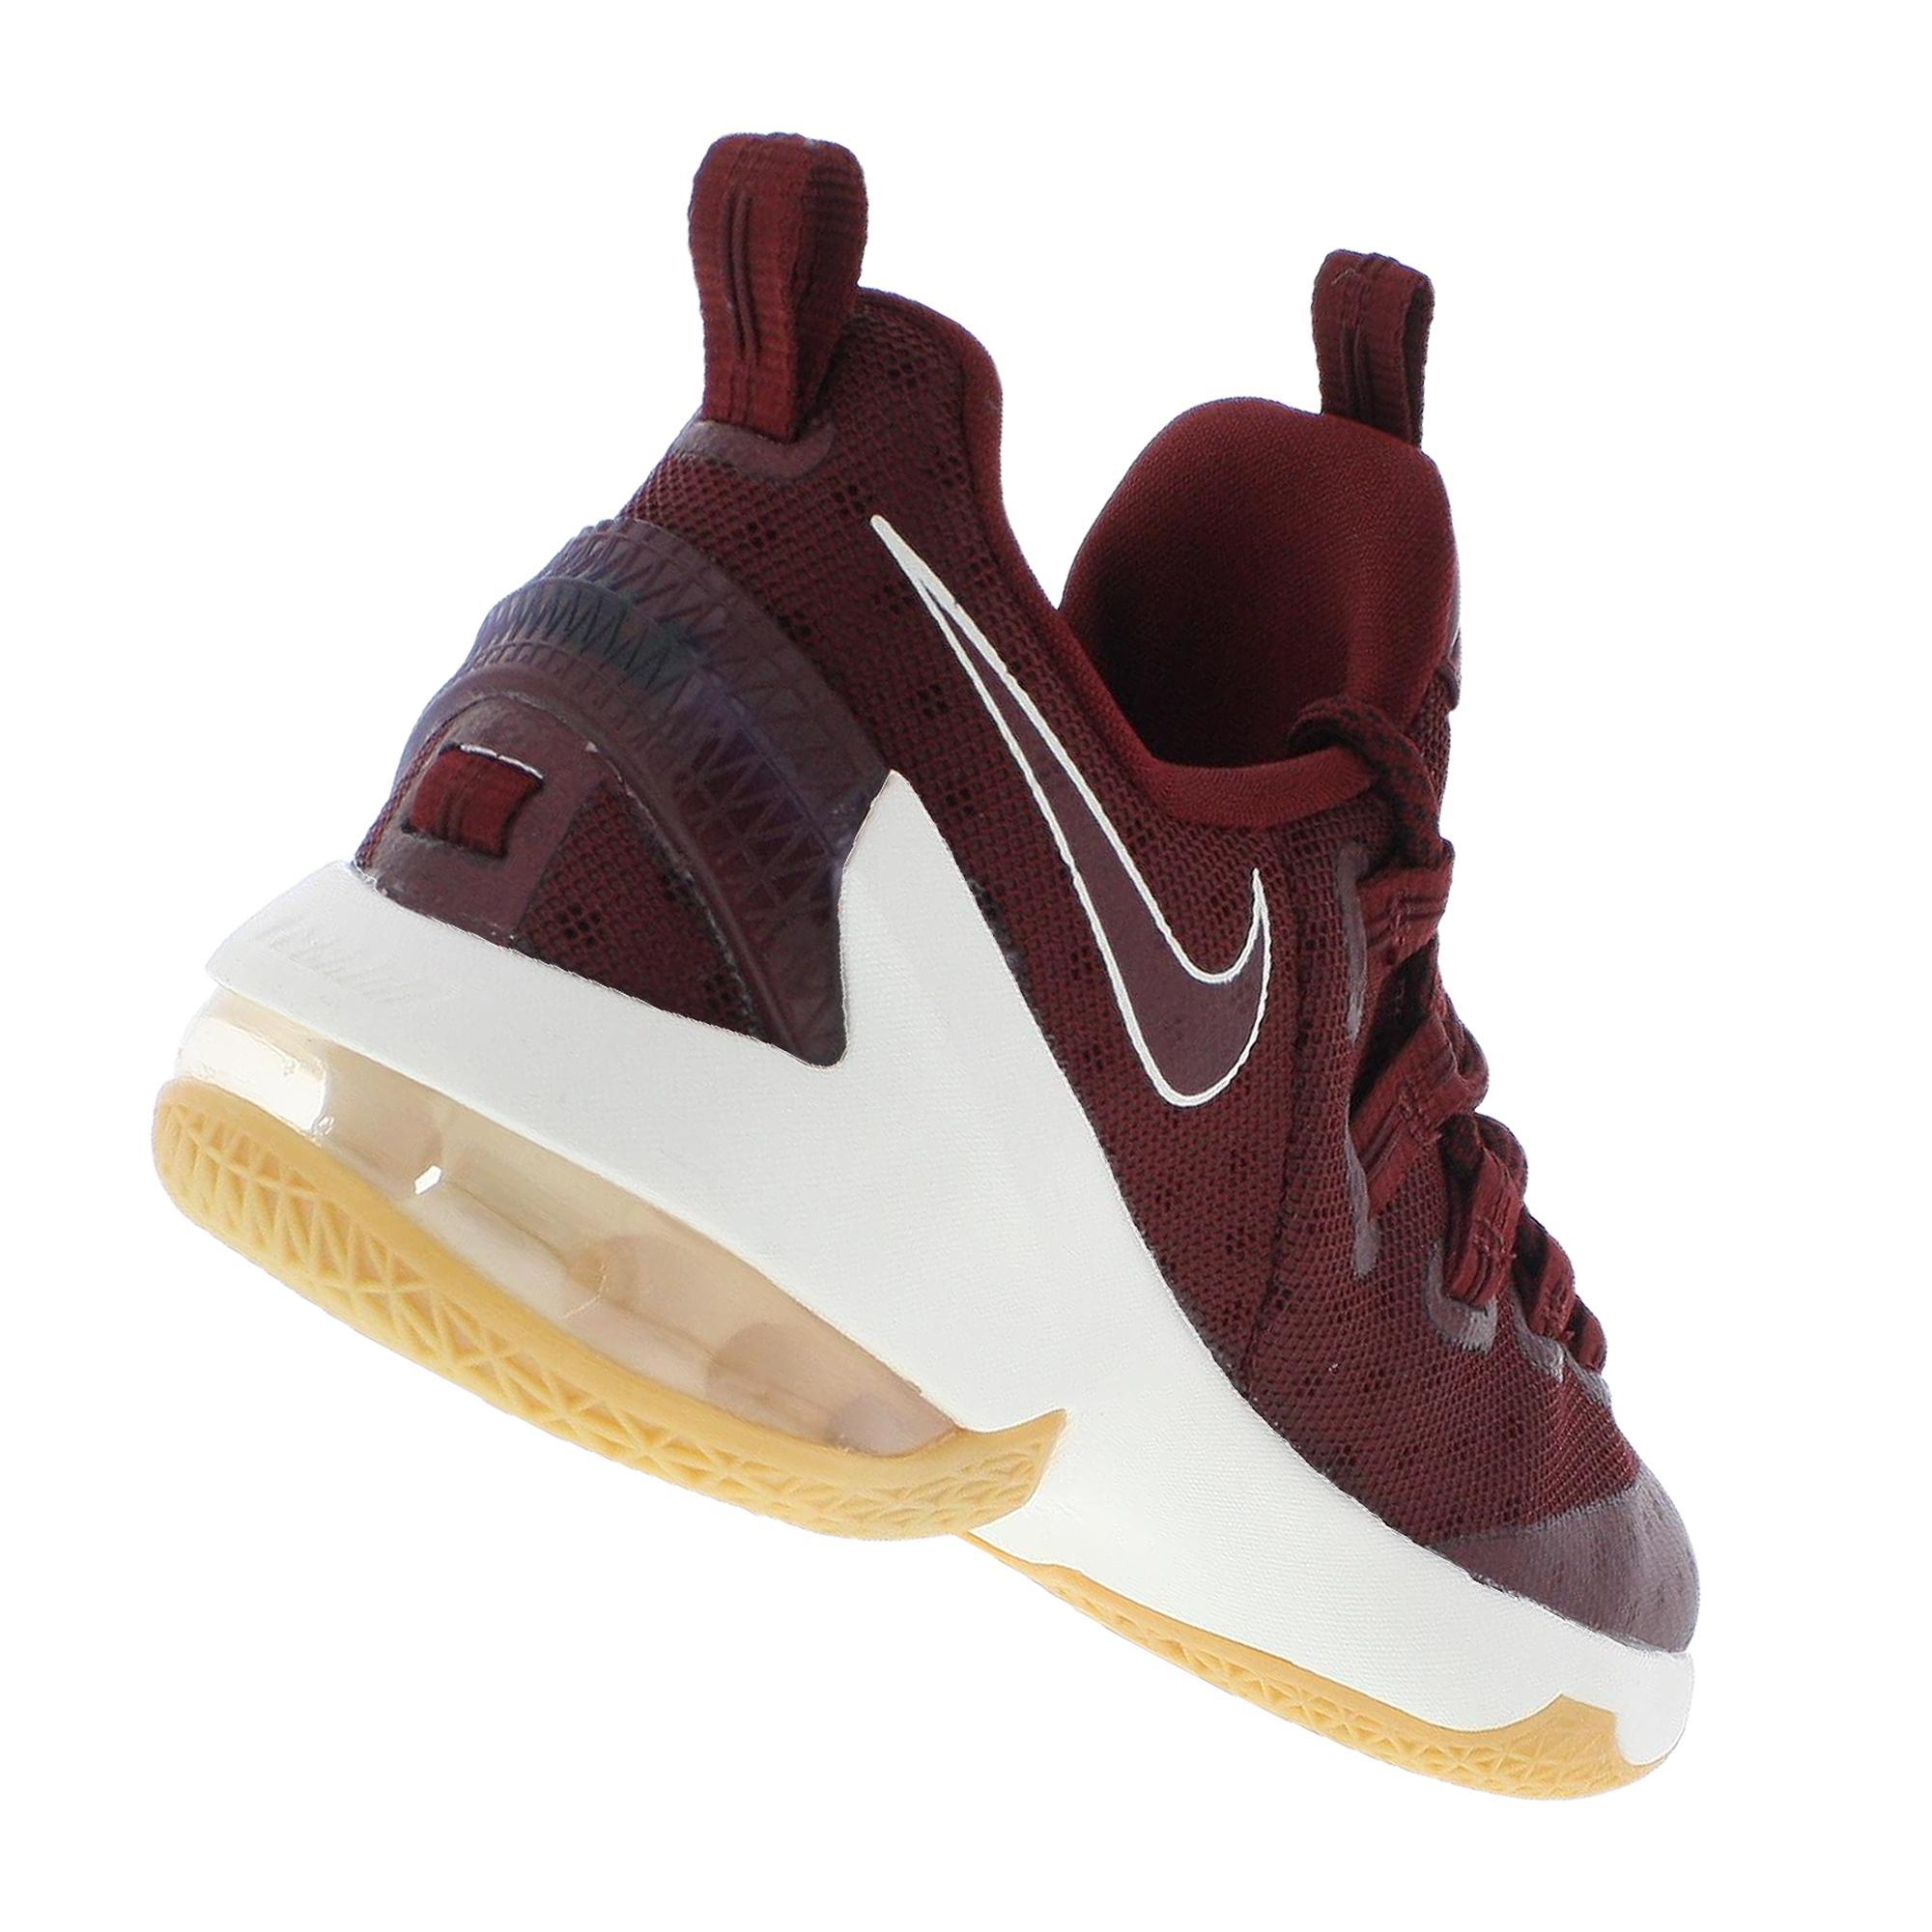 buy popular 0f5f8 d0a33 Nike LeBron James XIII Low (Gs) Spor Ayakkabı